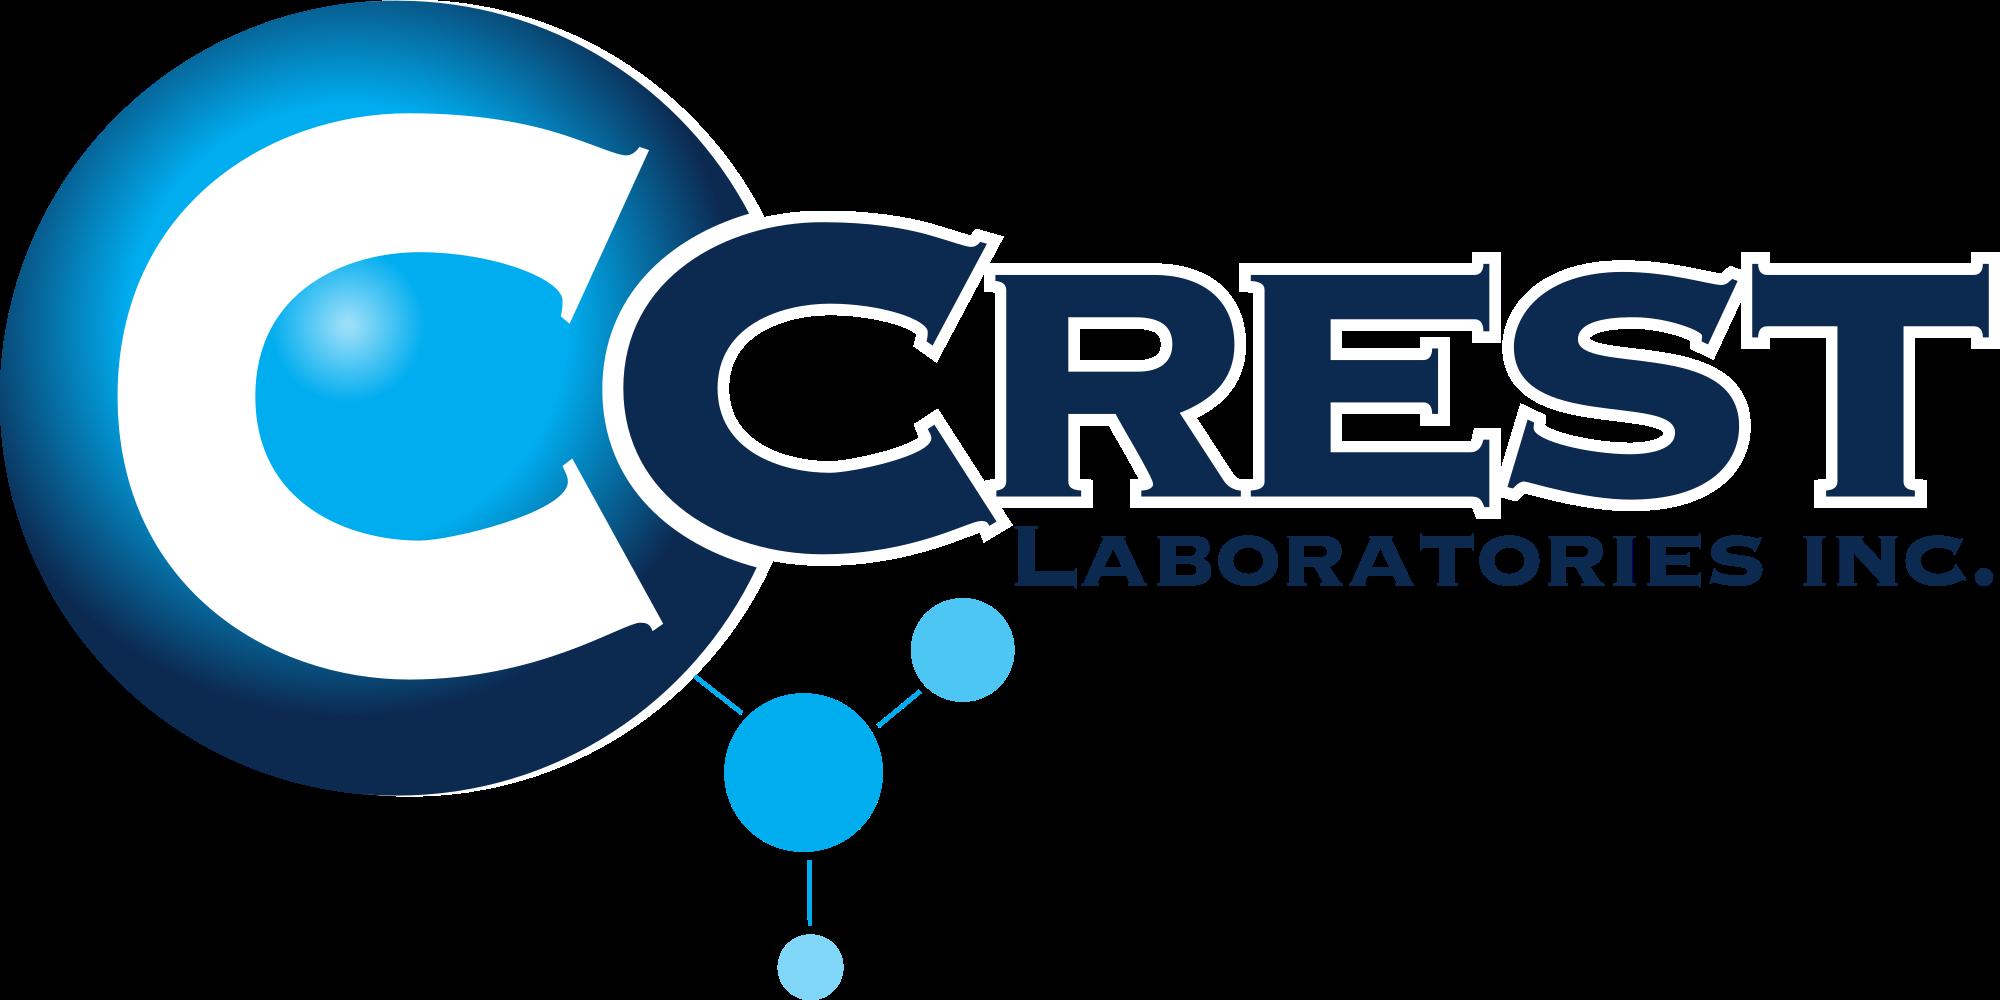 CCrest Logo